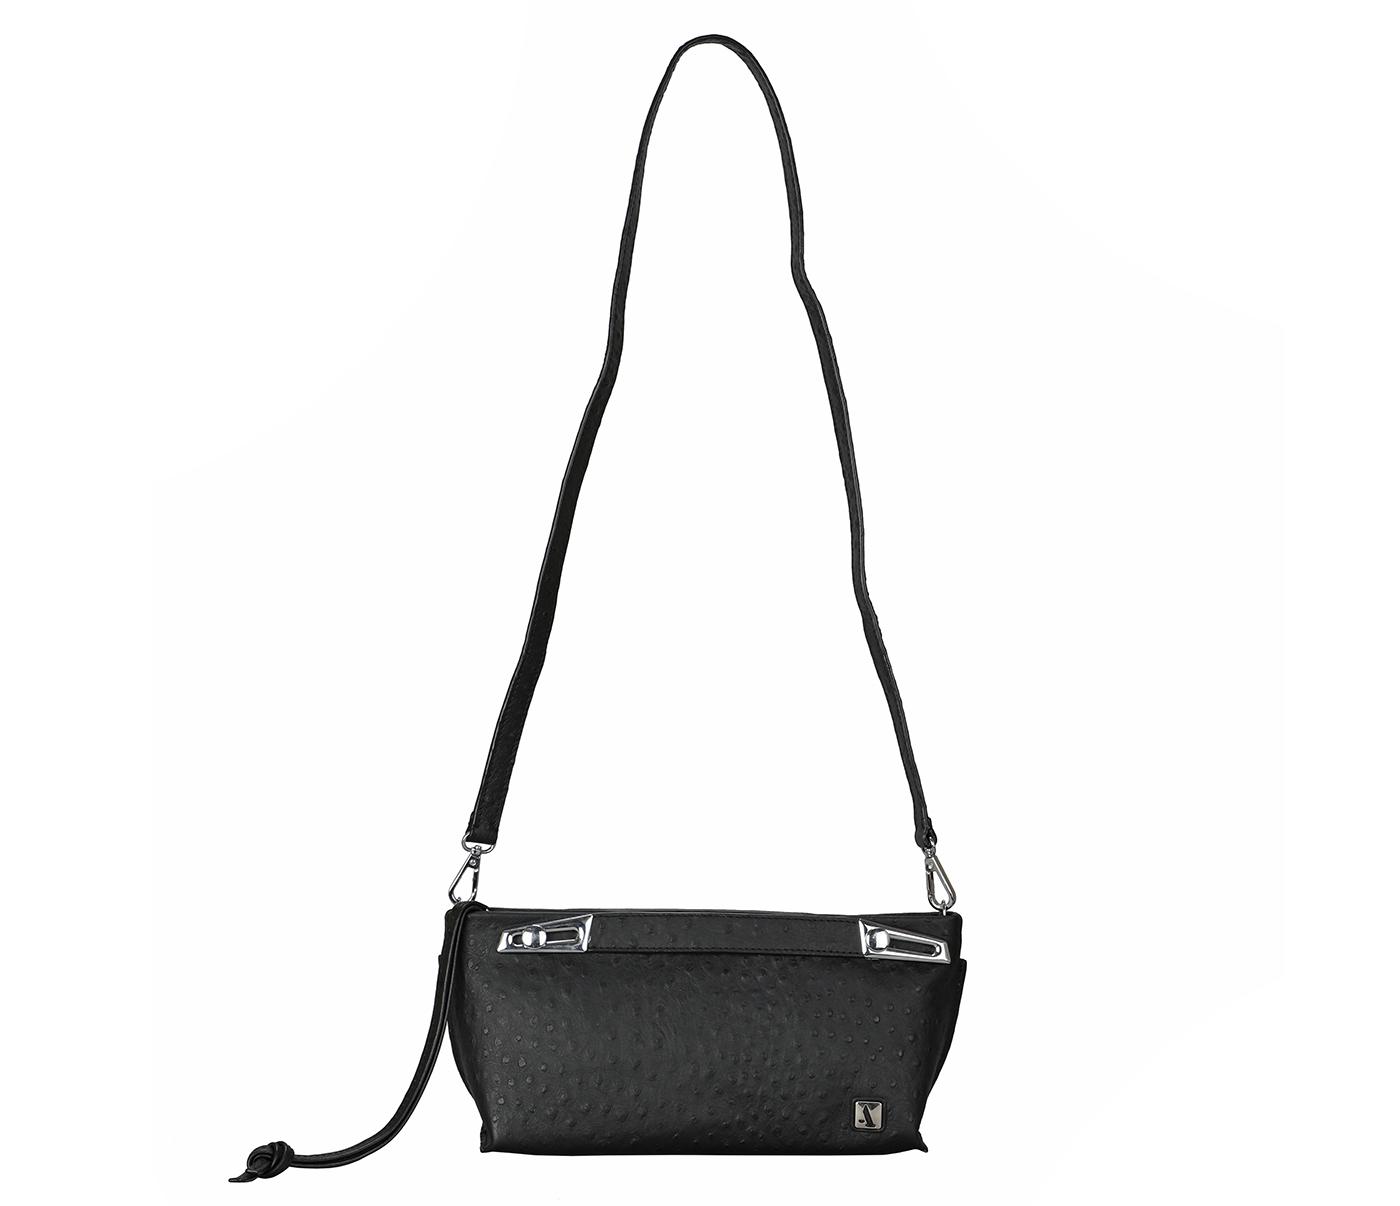 B875-Senobia-Evening Bag in Genuine Leather - Black